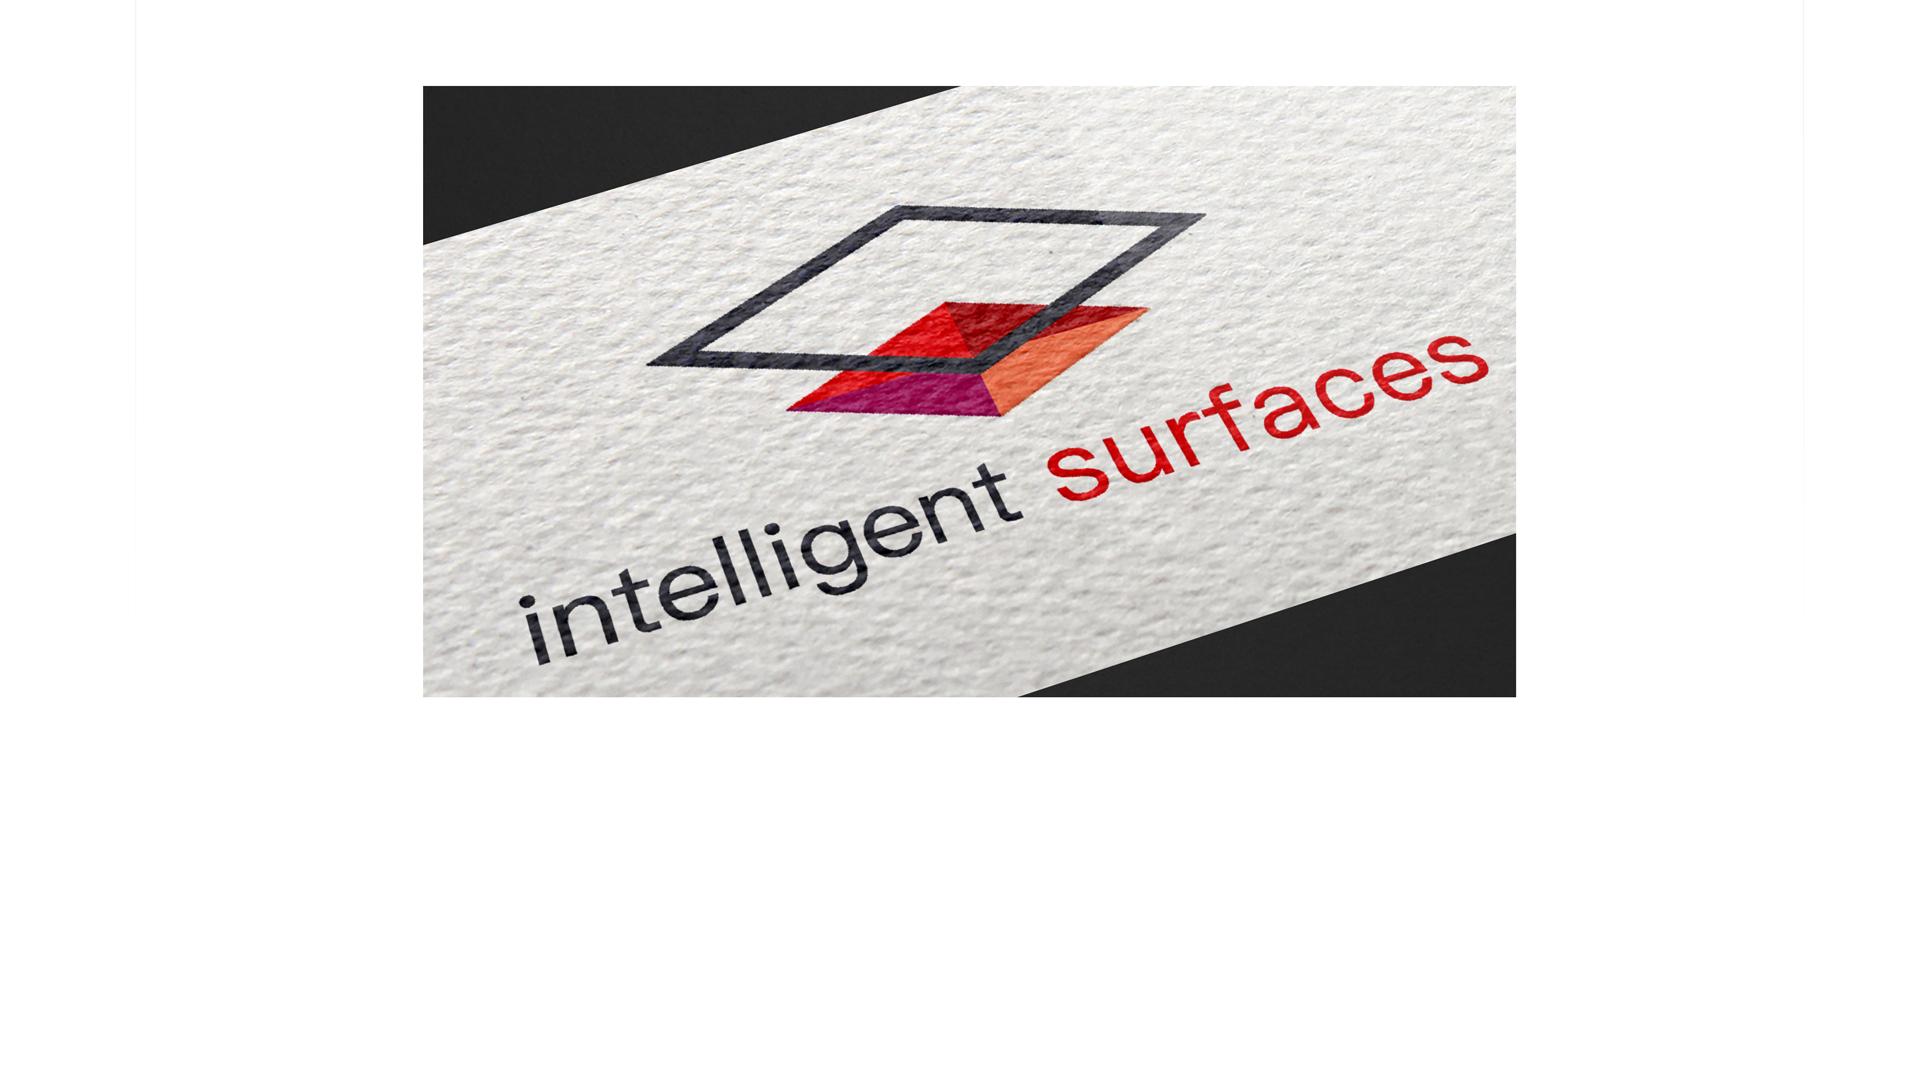 iMac-slider-IntelligentSurfaces-layer7